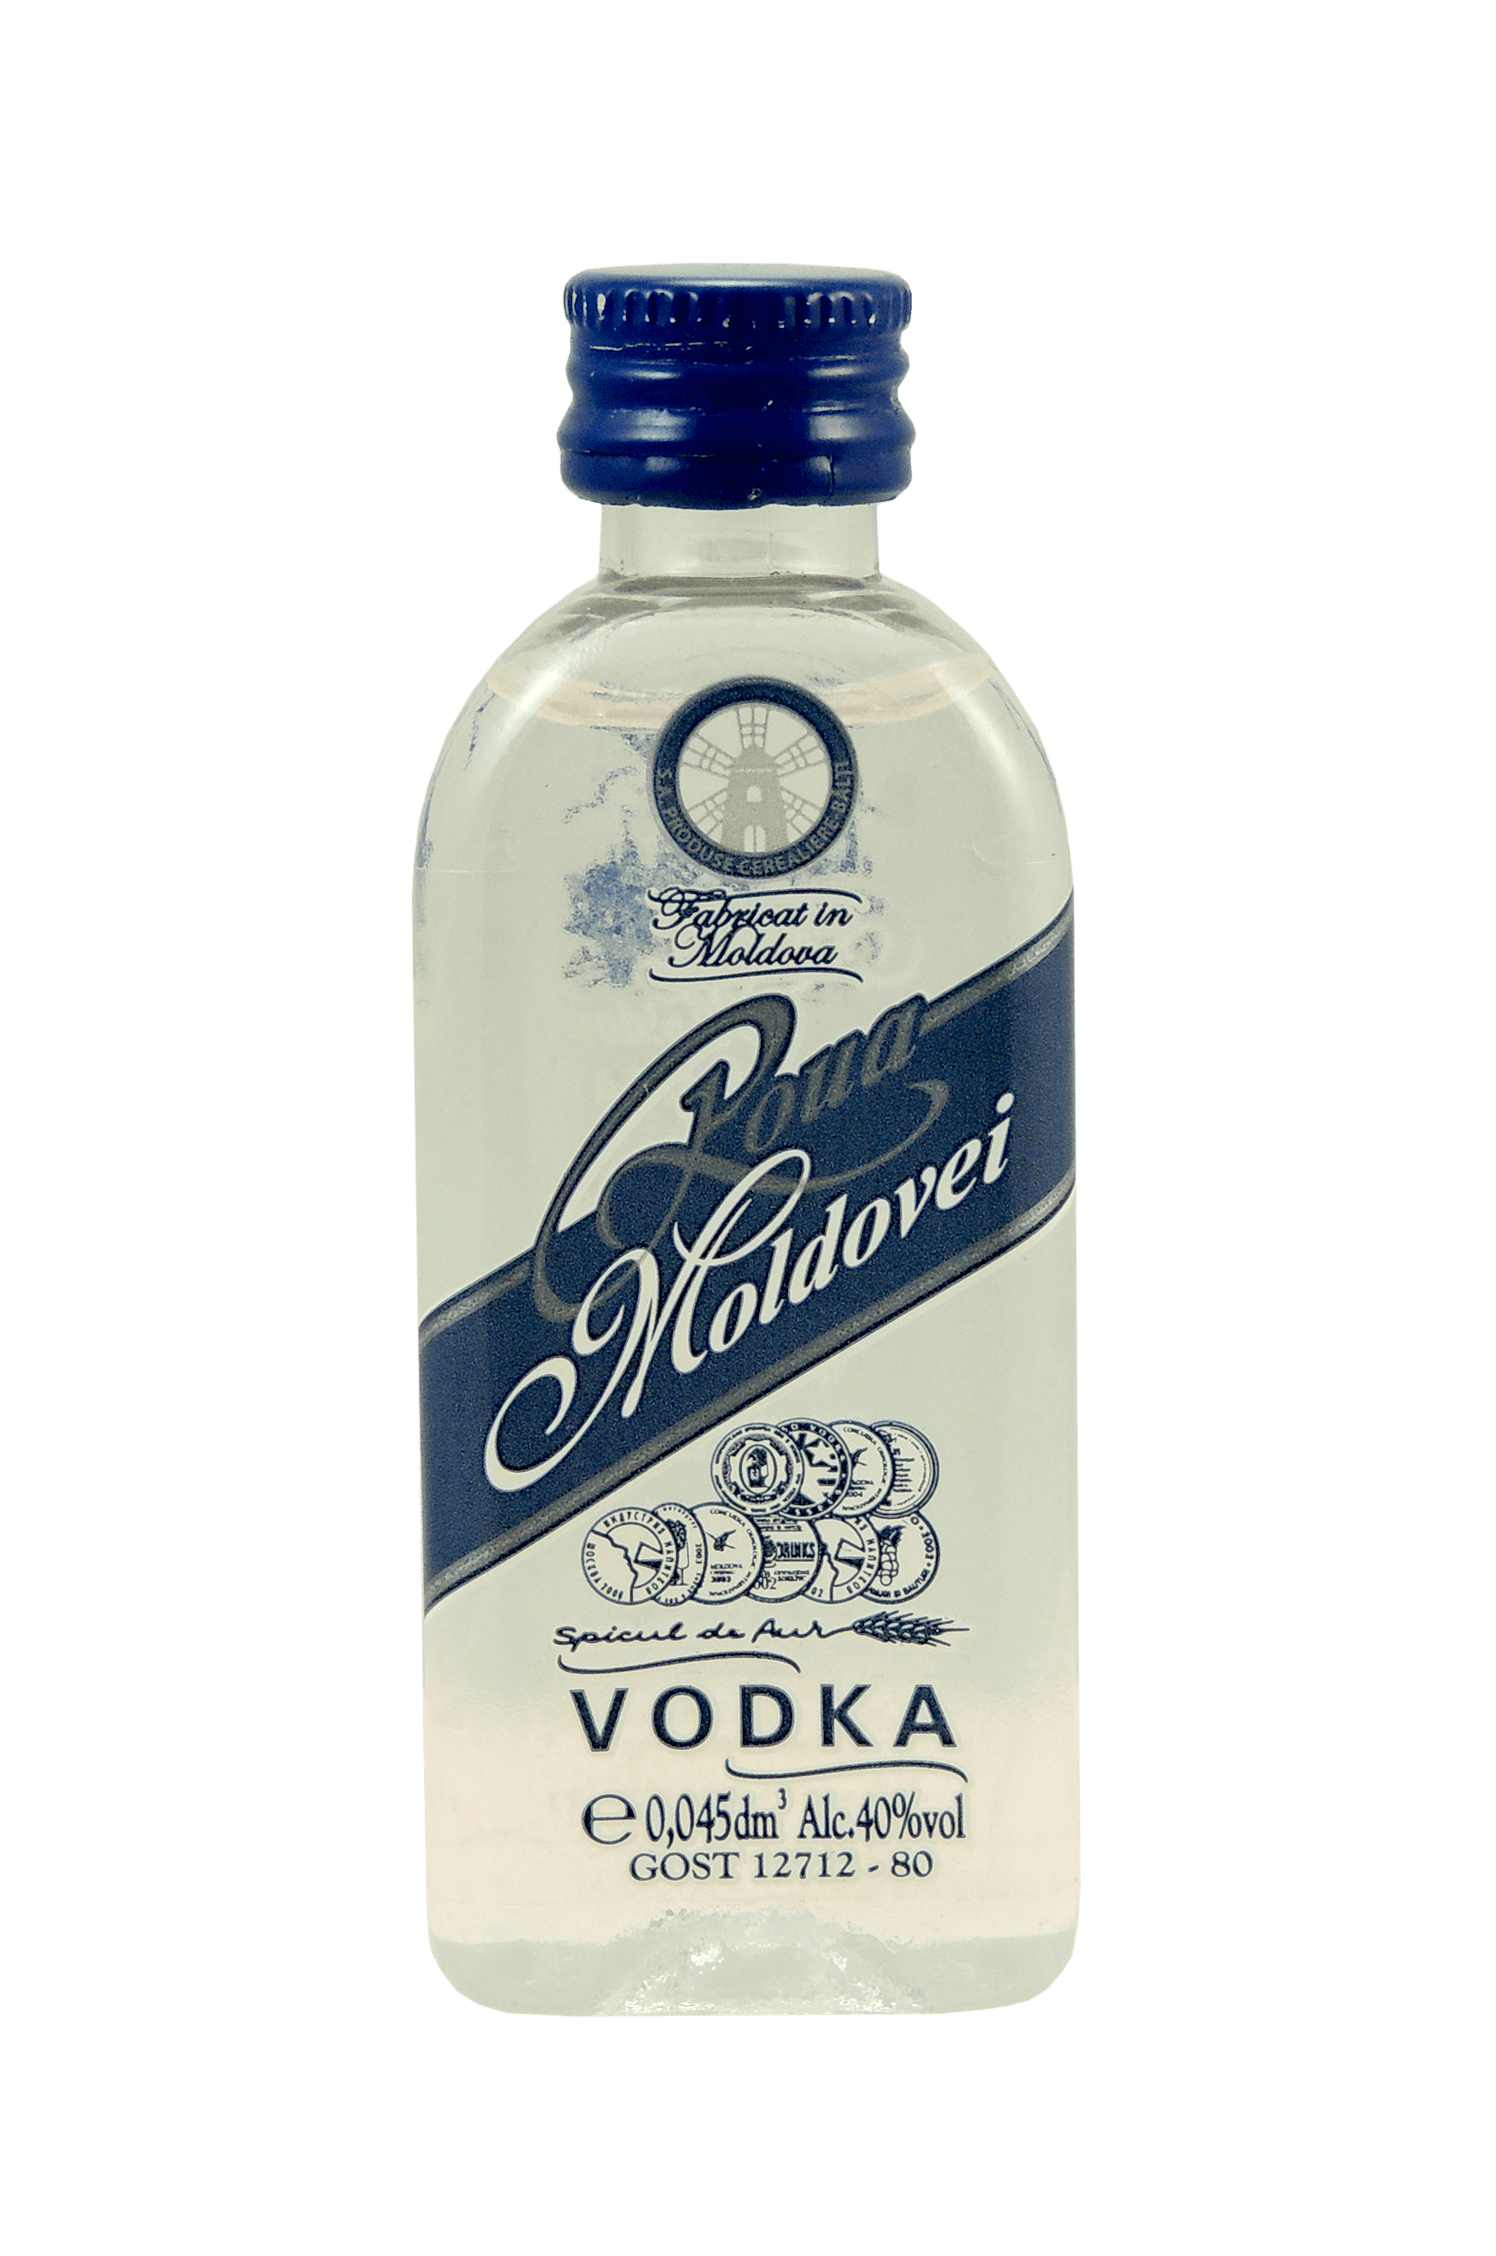 Roua Moldovei Vodka